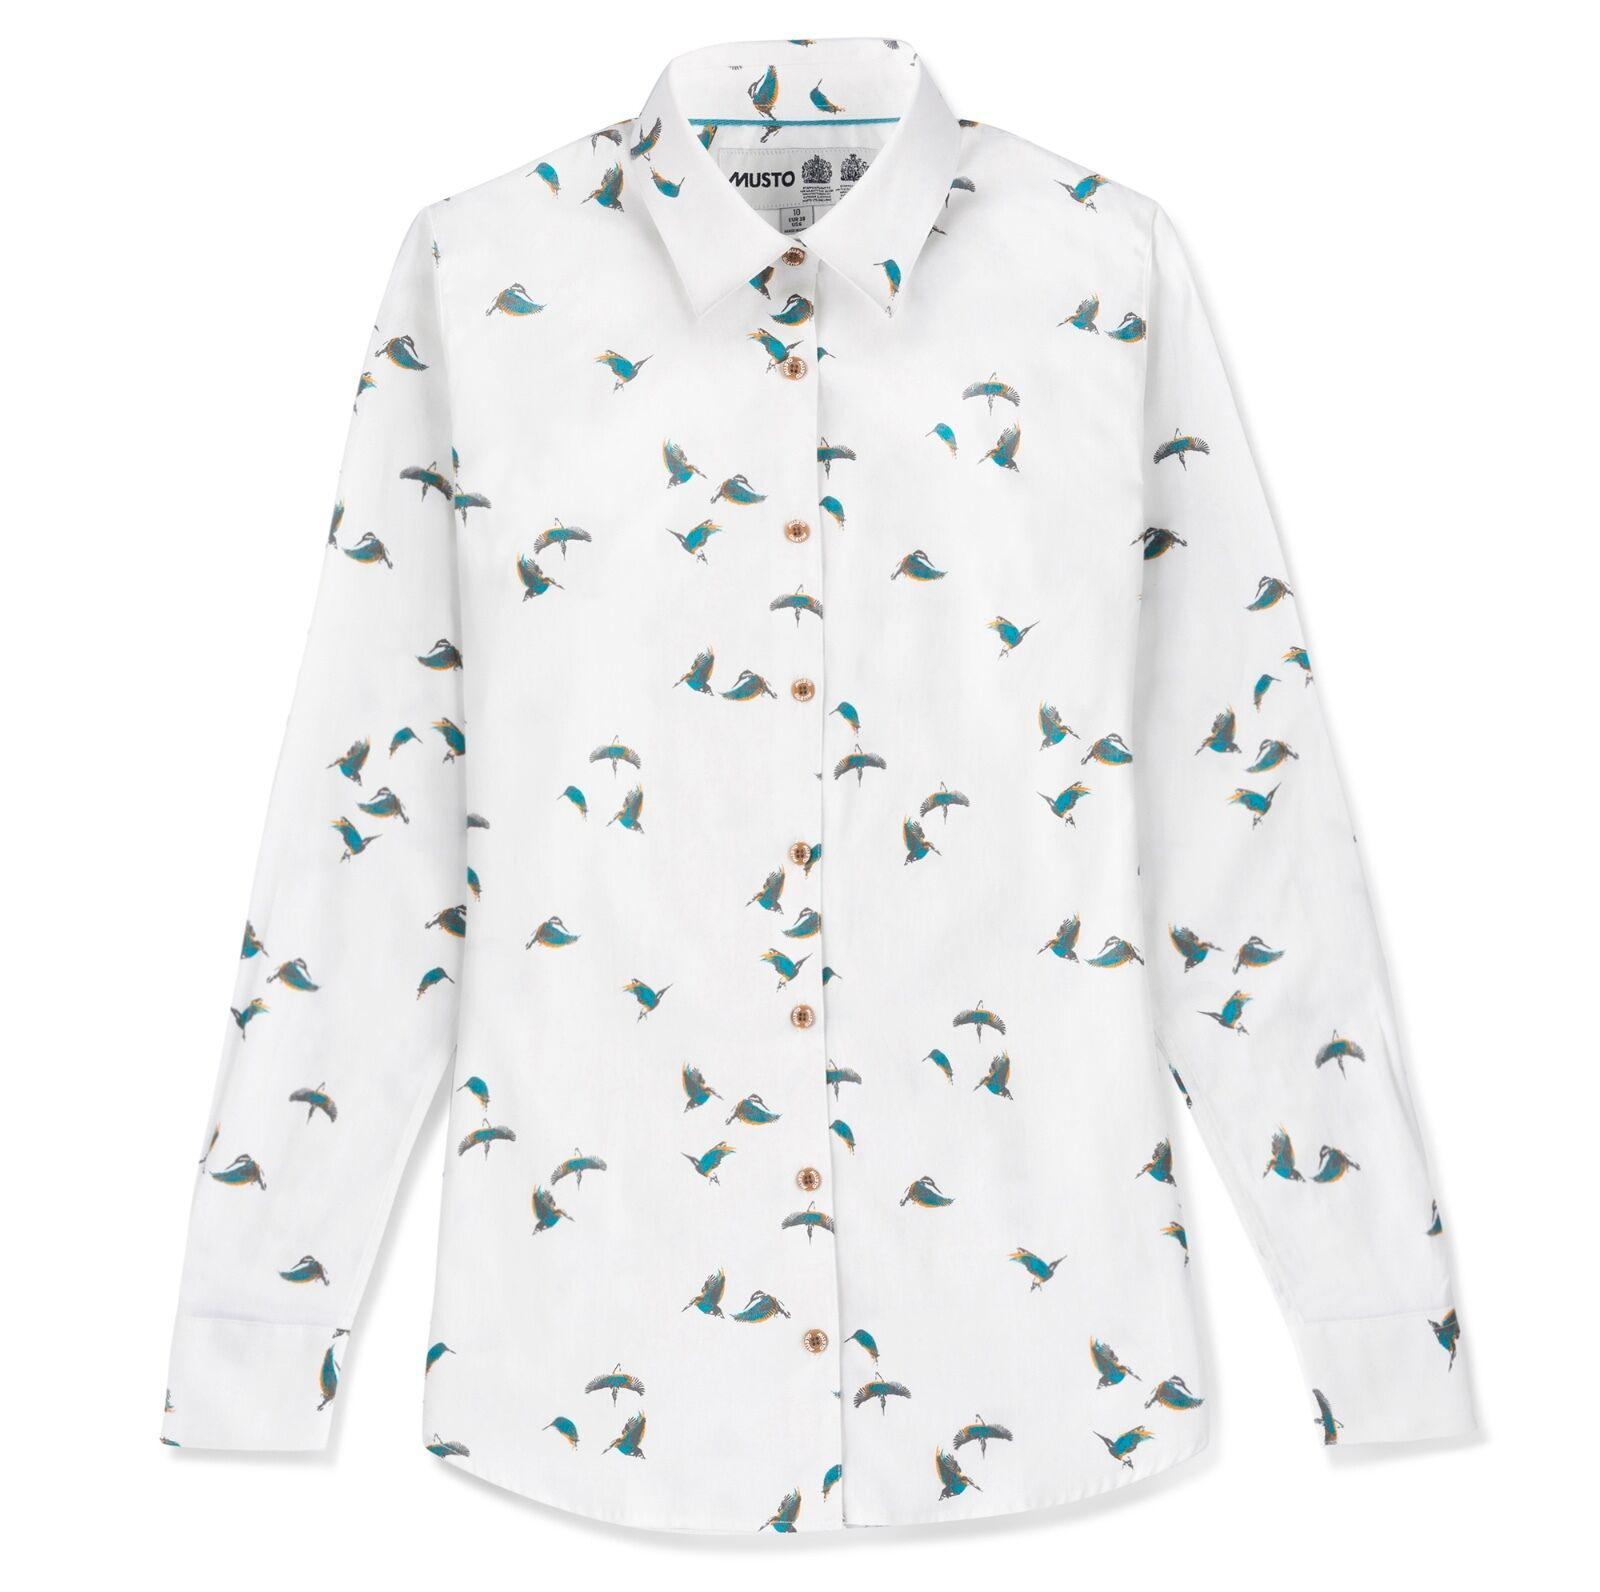 damen Musto Country Printed Shirt - CS2330 - all Größes - new